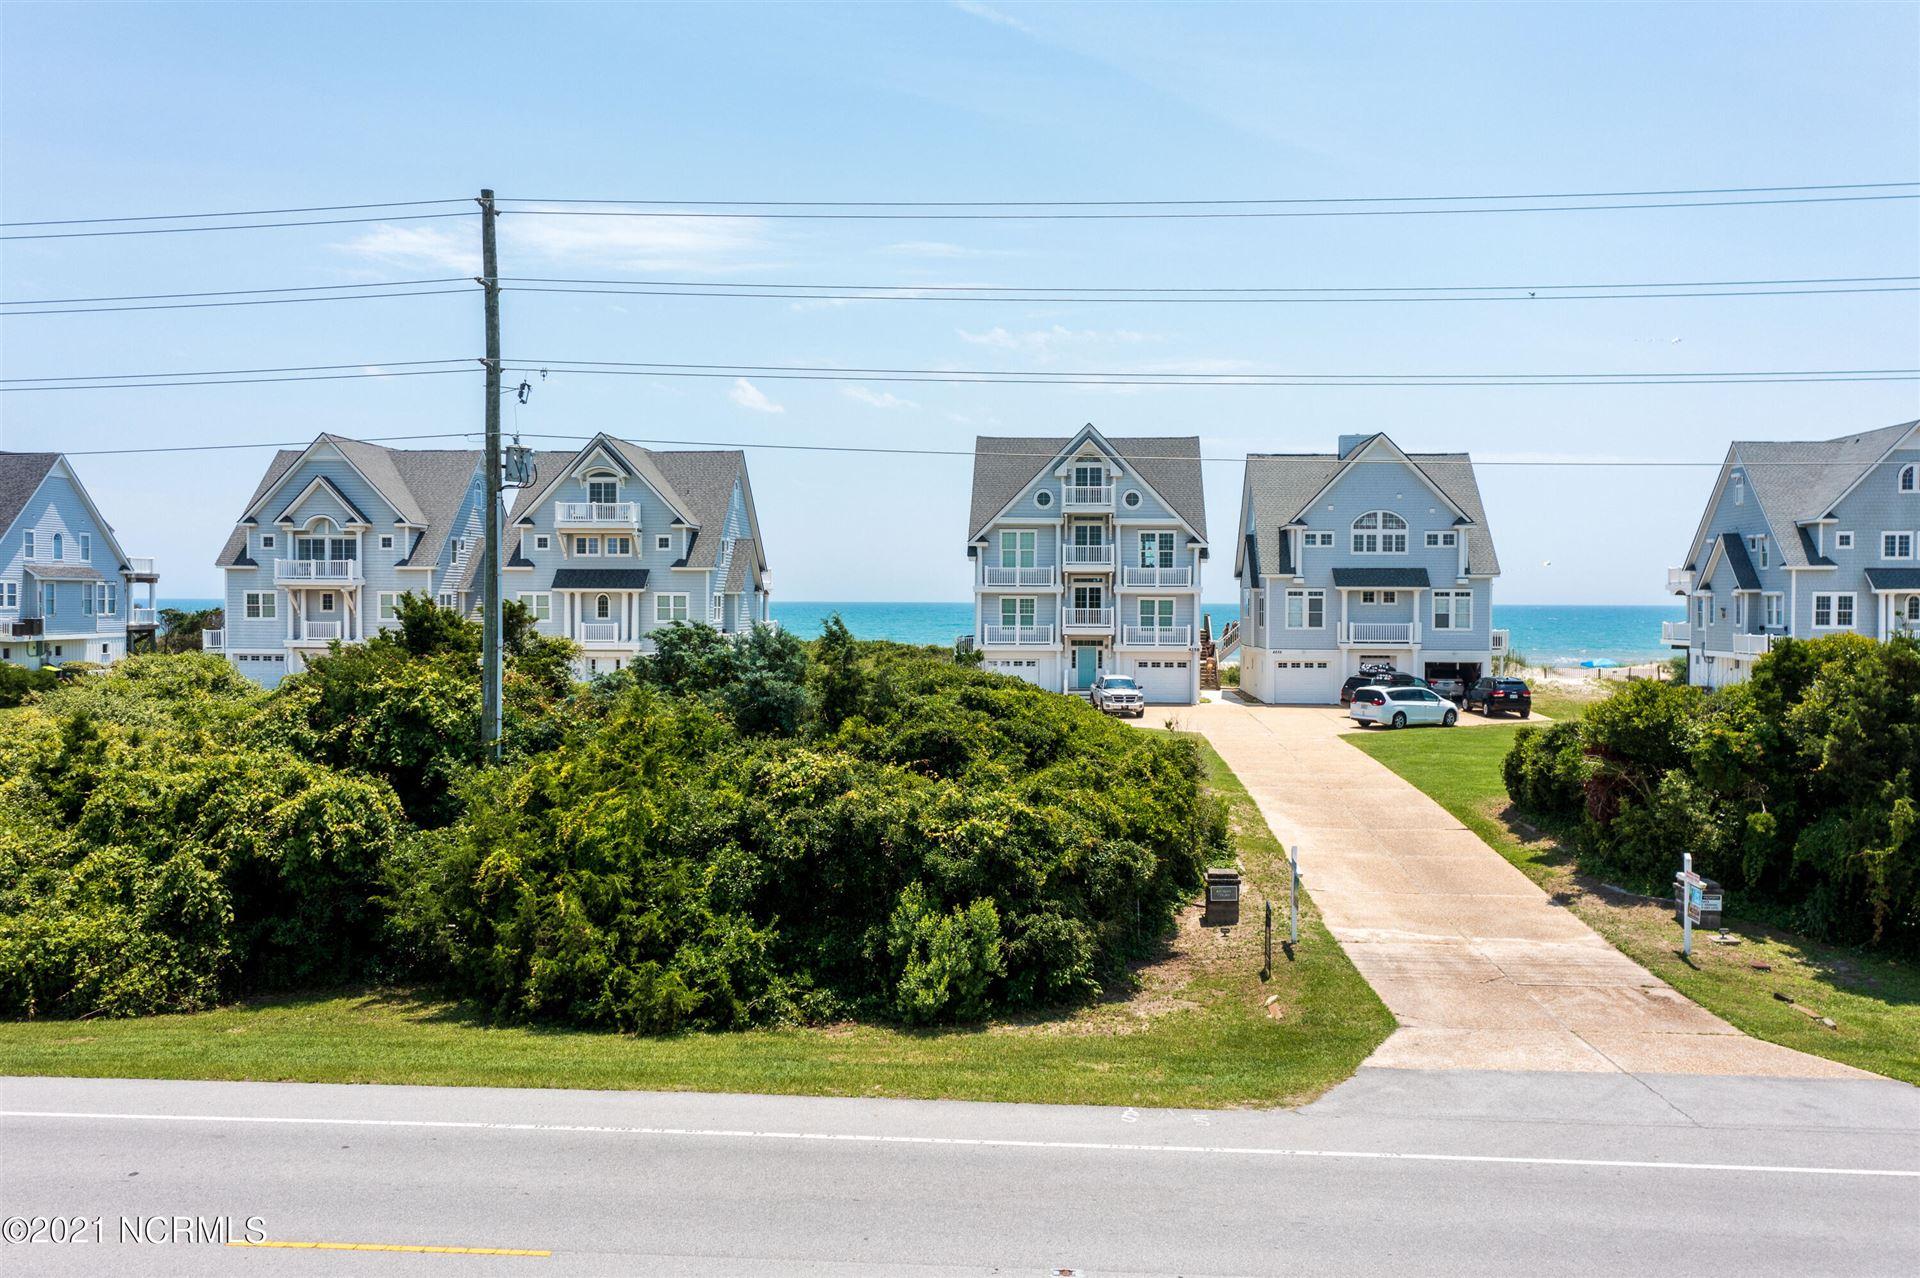 Photo of 4260 Island Drive, North Topsail Beach, NC 28460 (MLS # 100188377)